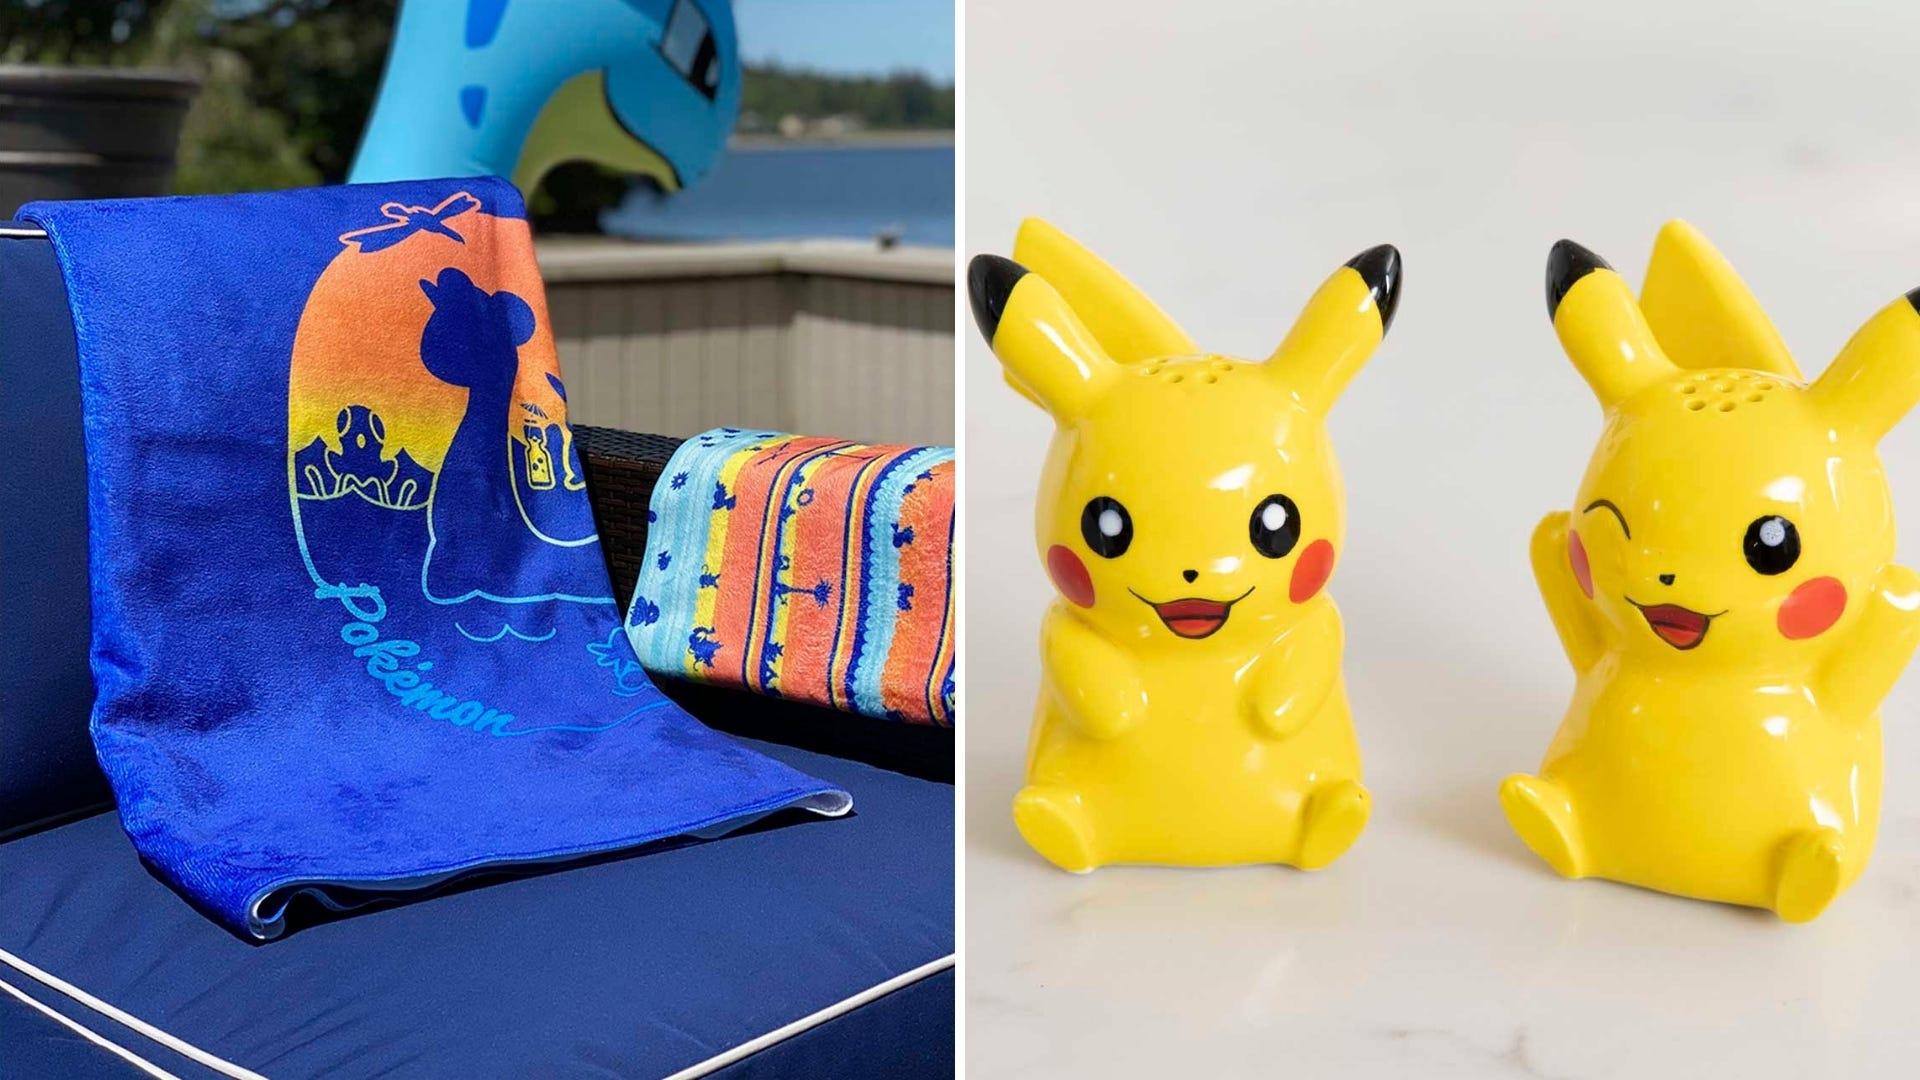 A blue beach towel and a Pikachu salt and pepper shaker set.